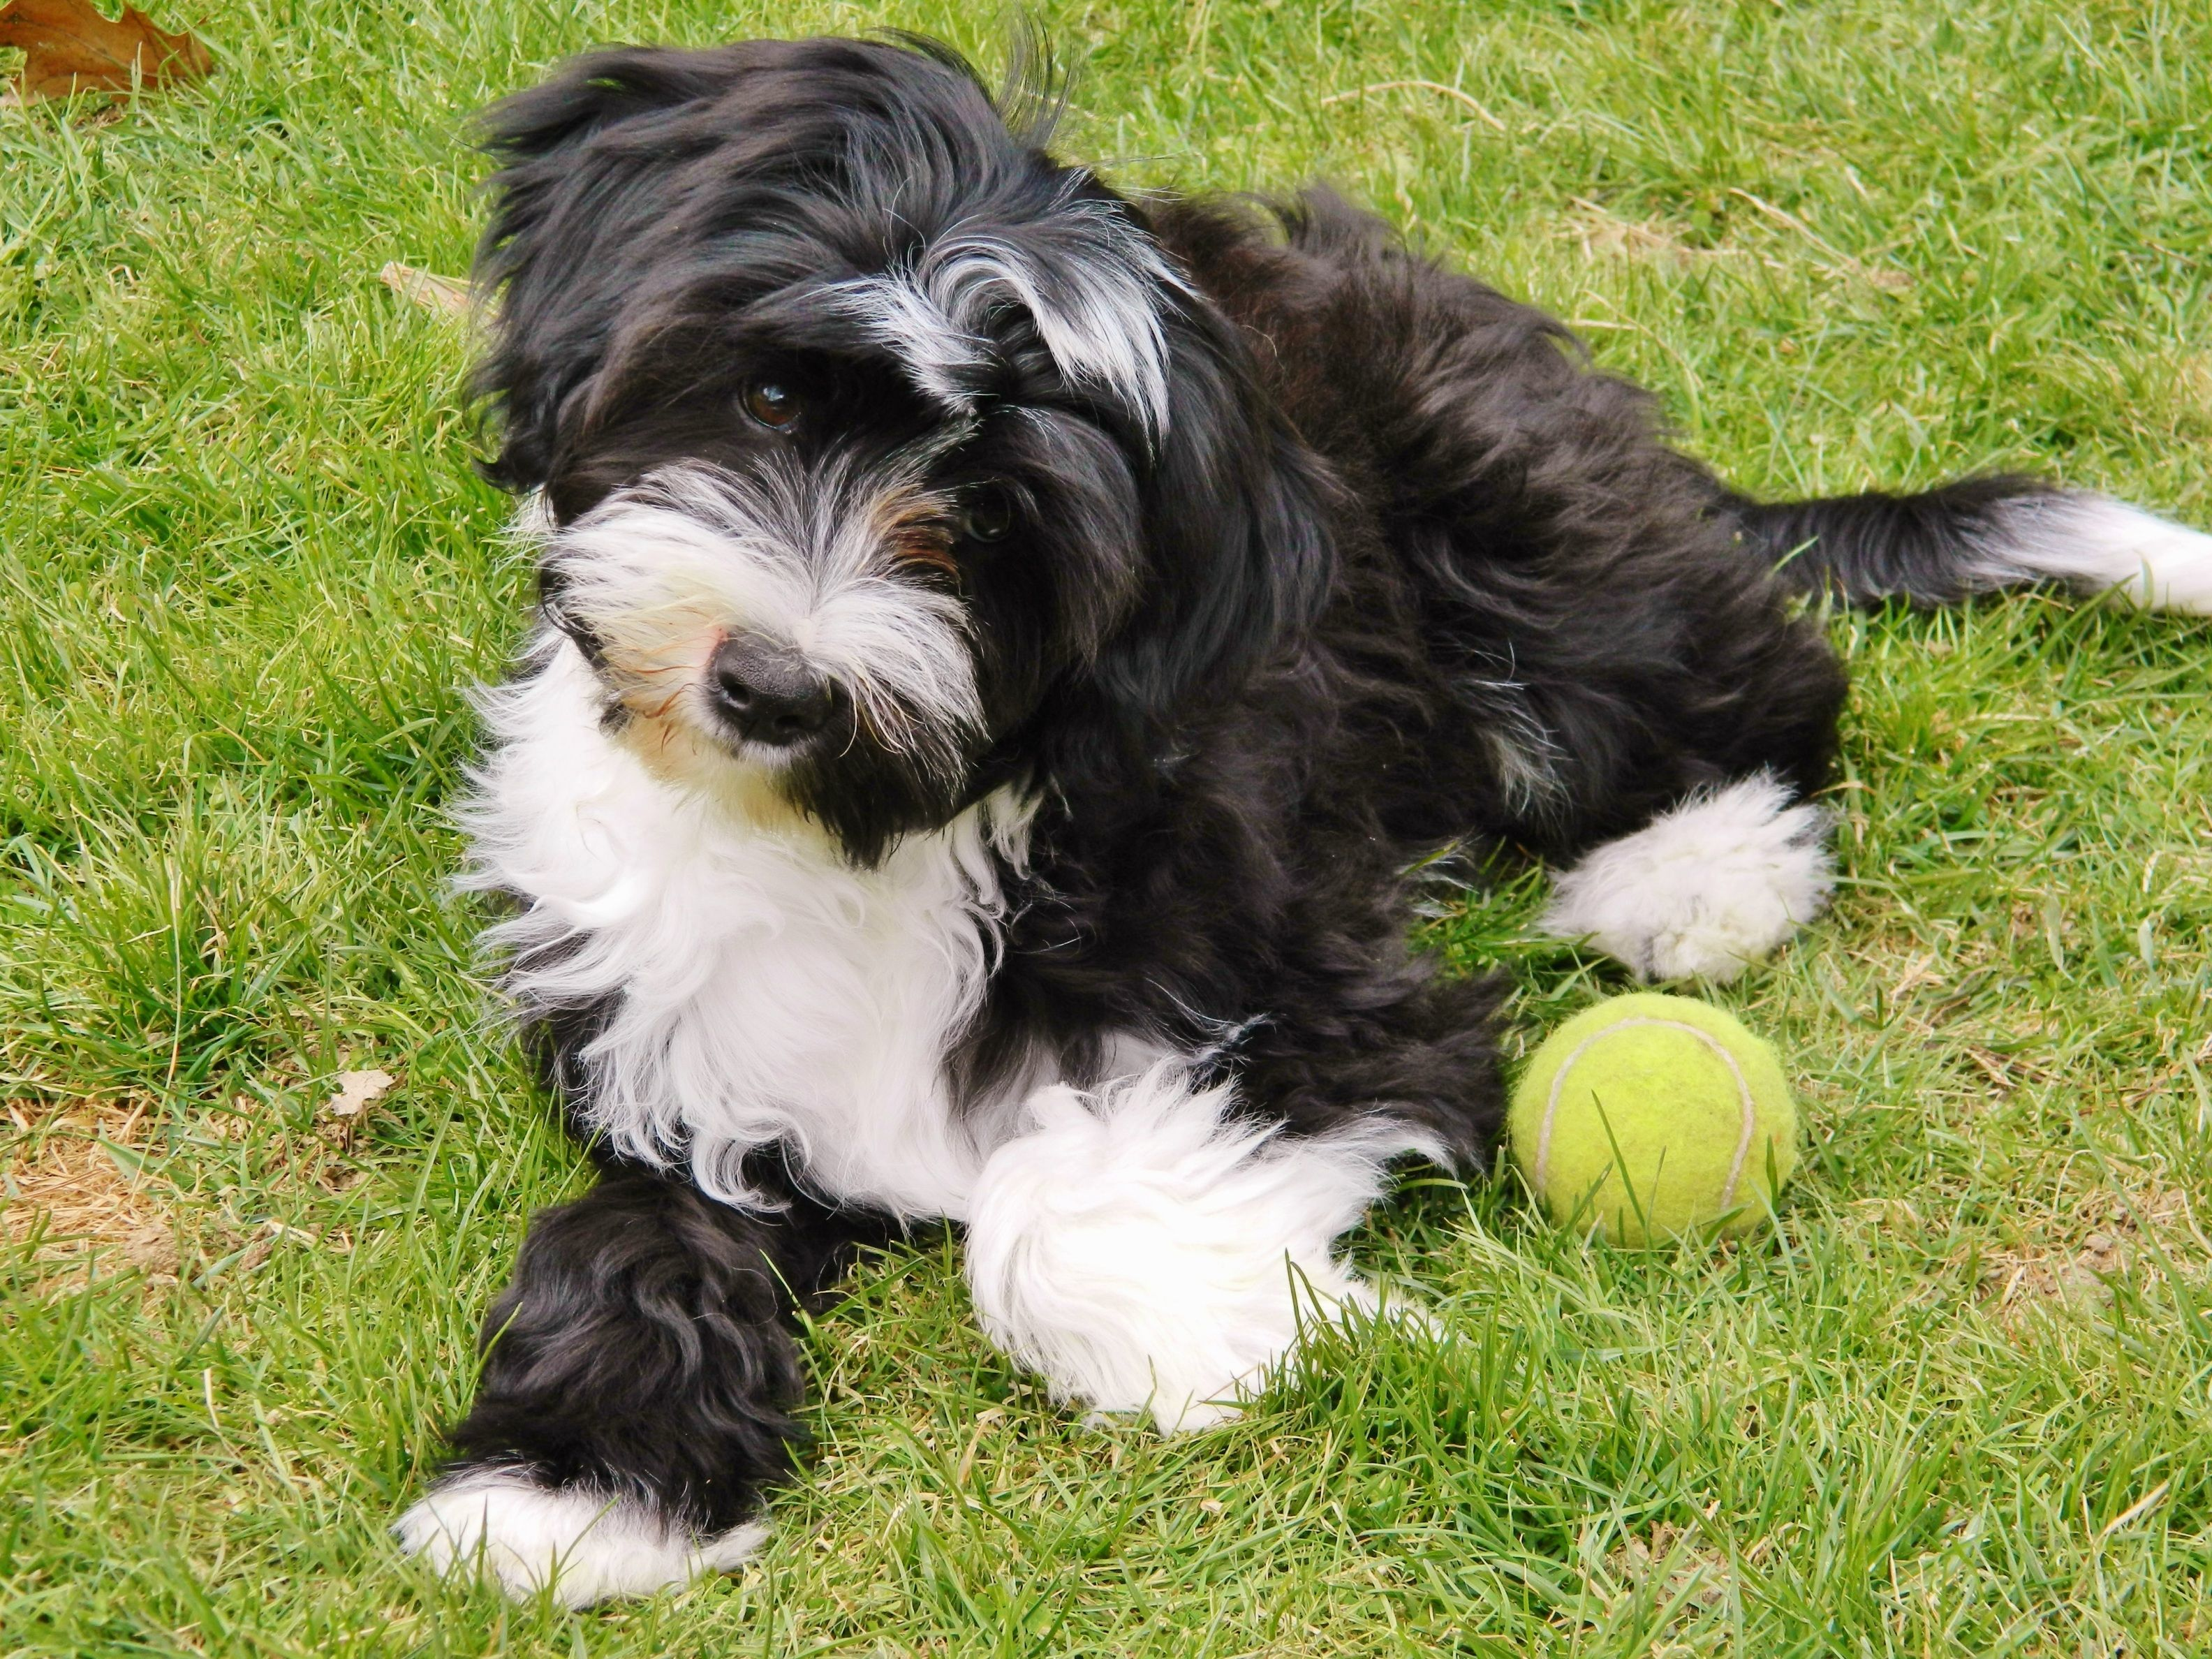 Life With A Kensington Tibetan Terrier Kensington Kennel Terrier Dog Breeds Tibetan Terrier Dog Breeds